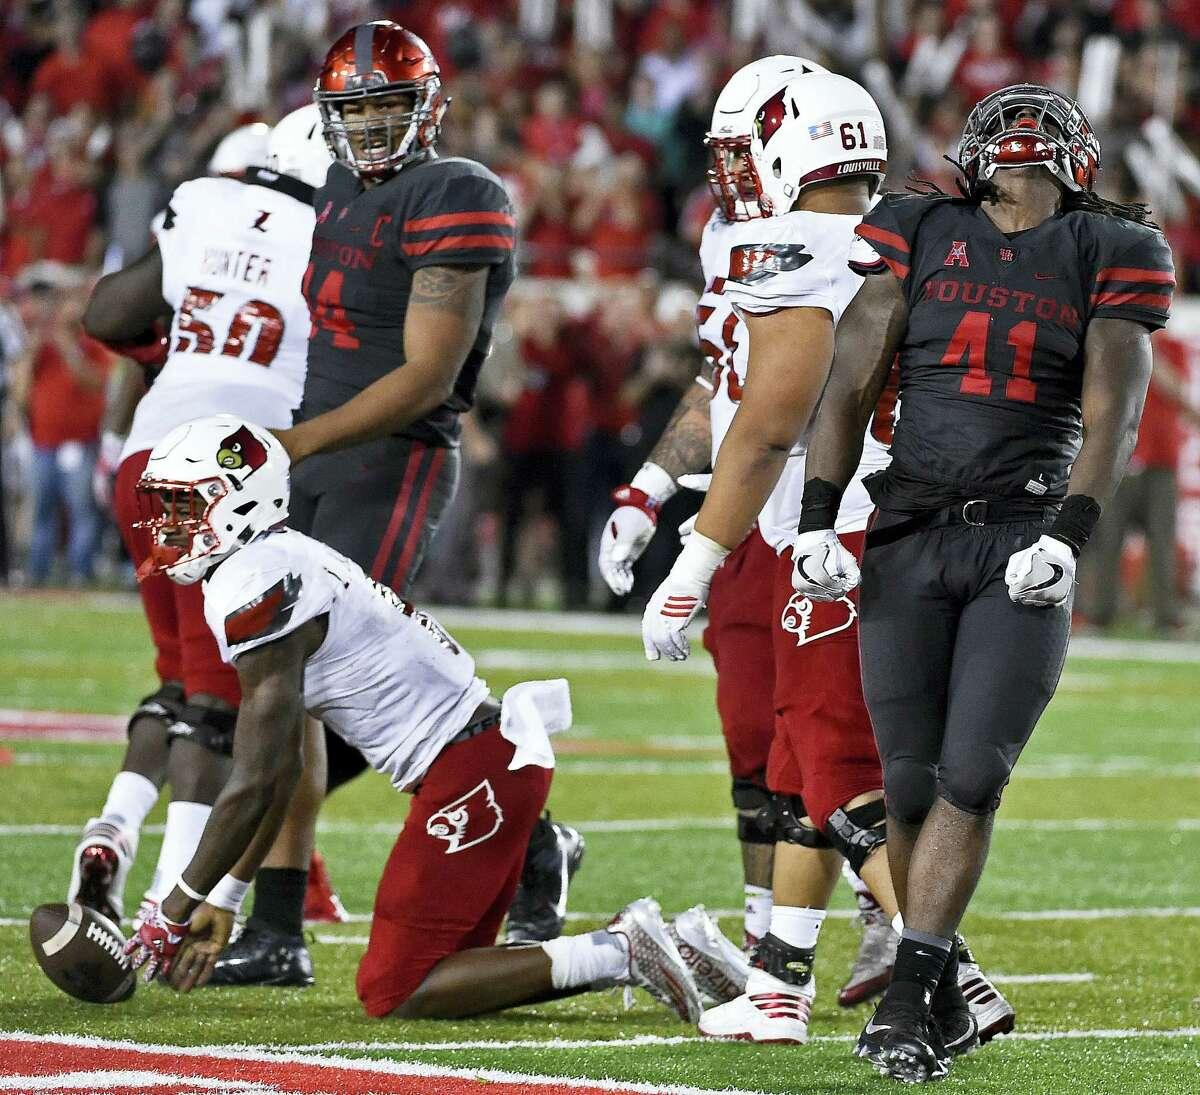 Houston linebacker Steven Taylor (41) reacts after sacking Louisville quarterback Lamar Jackson Saturday.